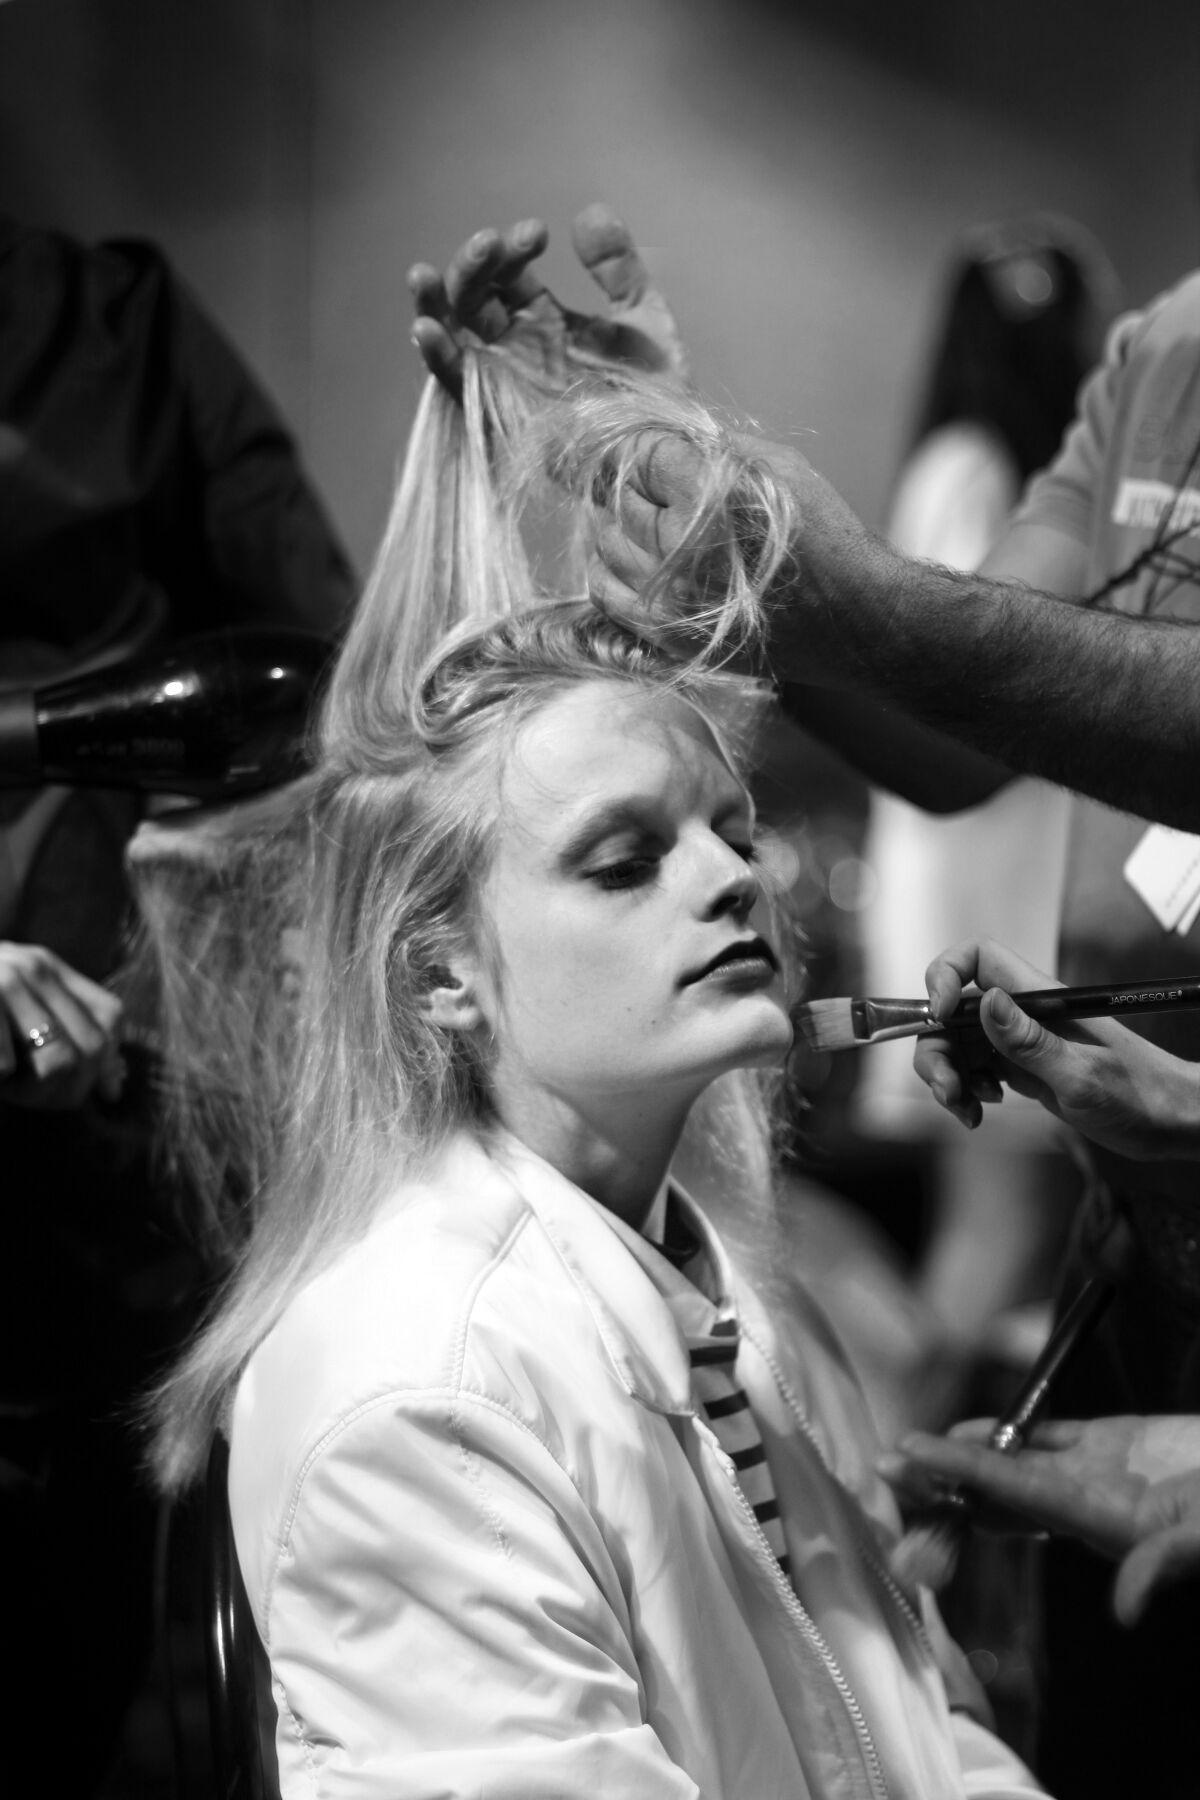 Hair Style Fashion Backstage